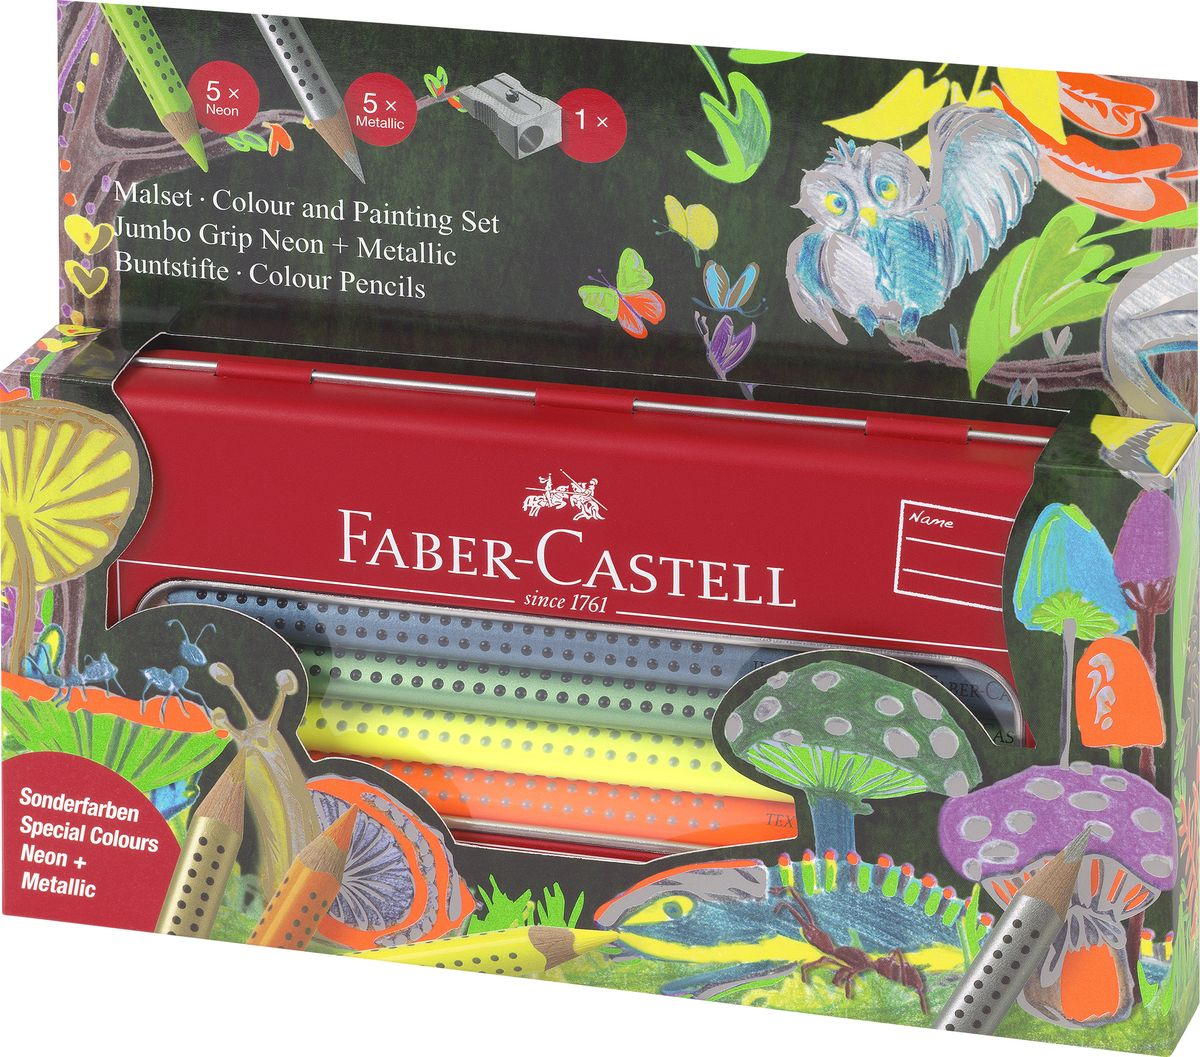 Faber-Castell Набор цветных карандашей Jumbo Grip в пенале с точилкой 10 шт карандаши цветные faber castell jumbo grip 110906 трехгран 6цв карт кор